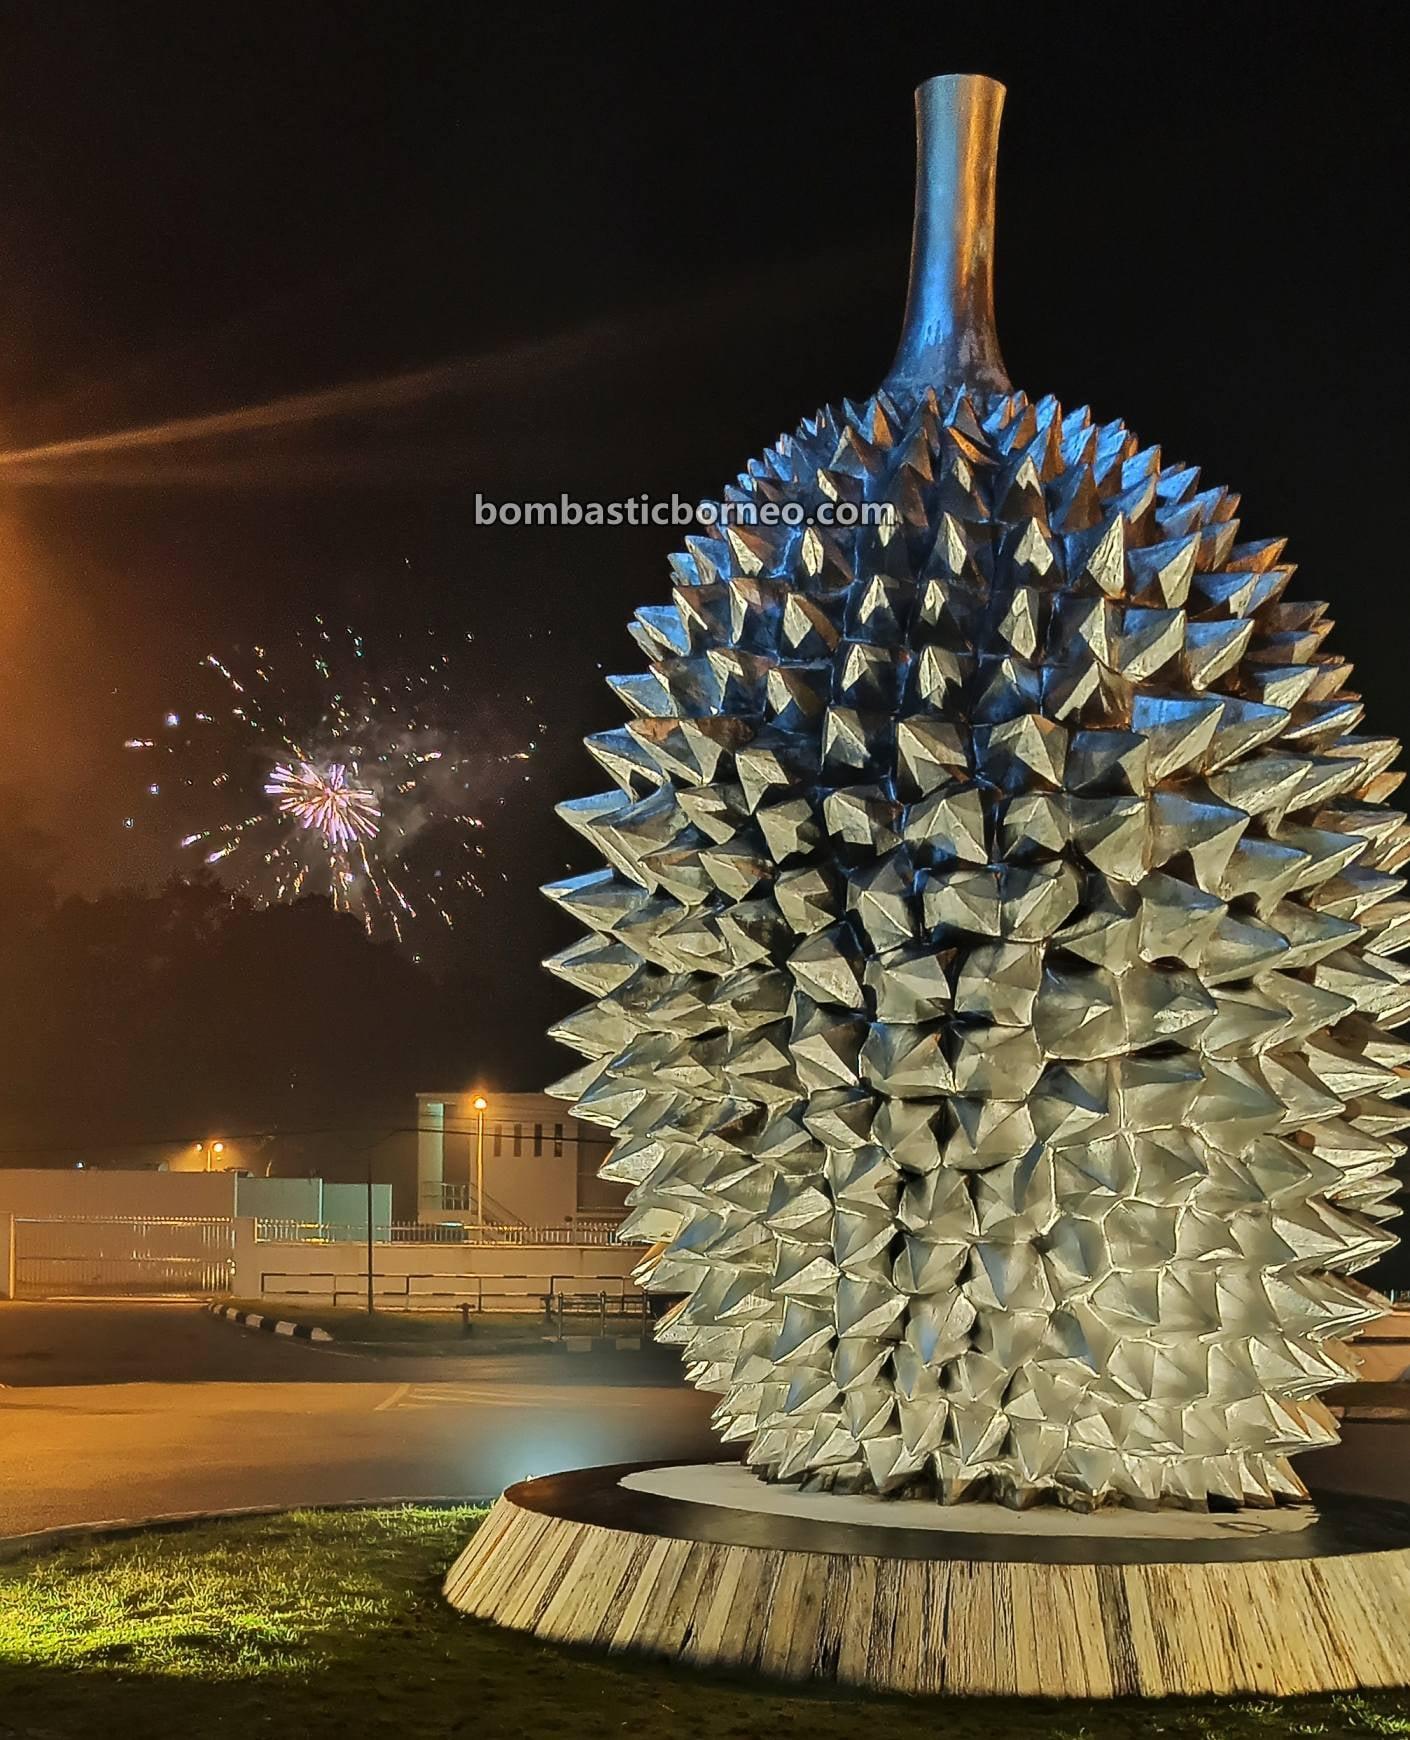 Serian town, Borneo, Roxy Hotel Serian, backpacker, destination, exploration, objek wisata, tourist attraction, travel guide, travel locally, 探索罗洲游踪, 马来西亚砂拉越,, 西连镇,